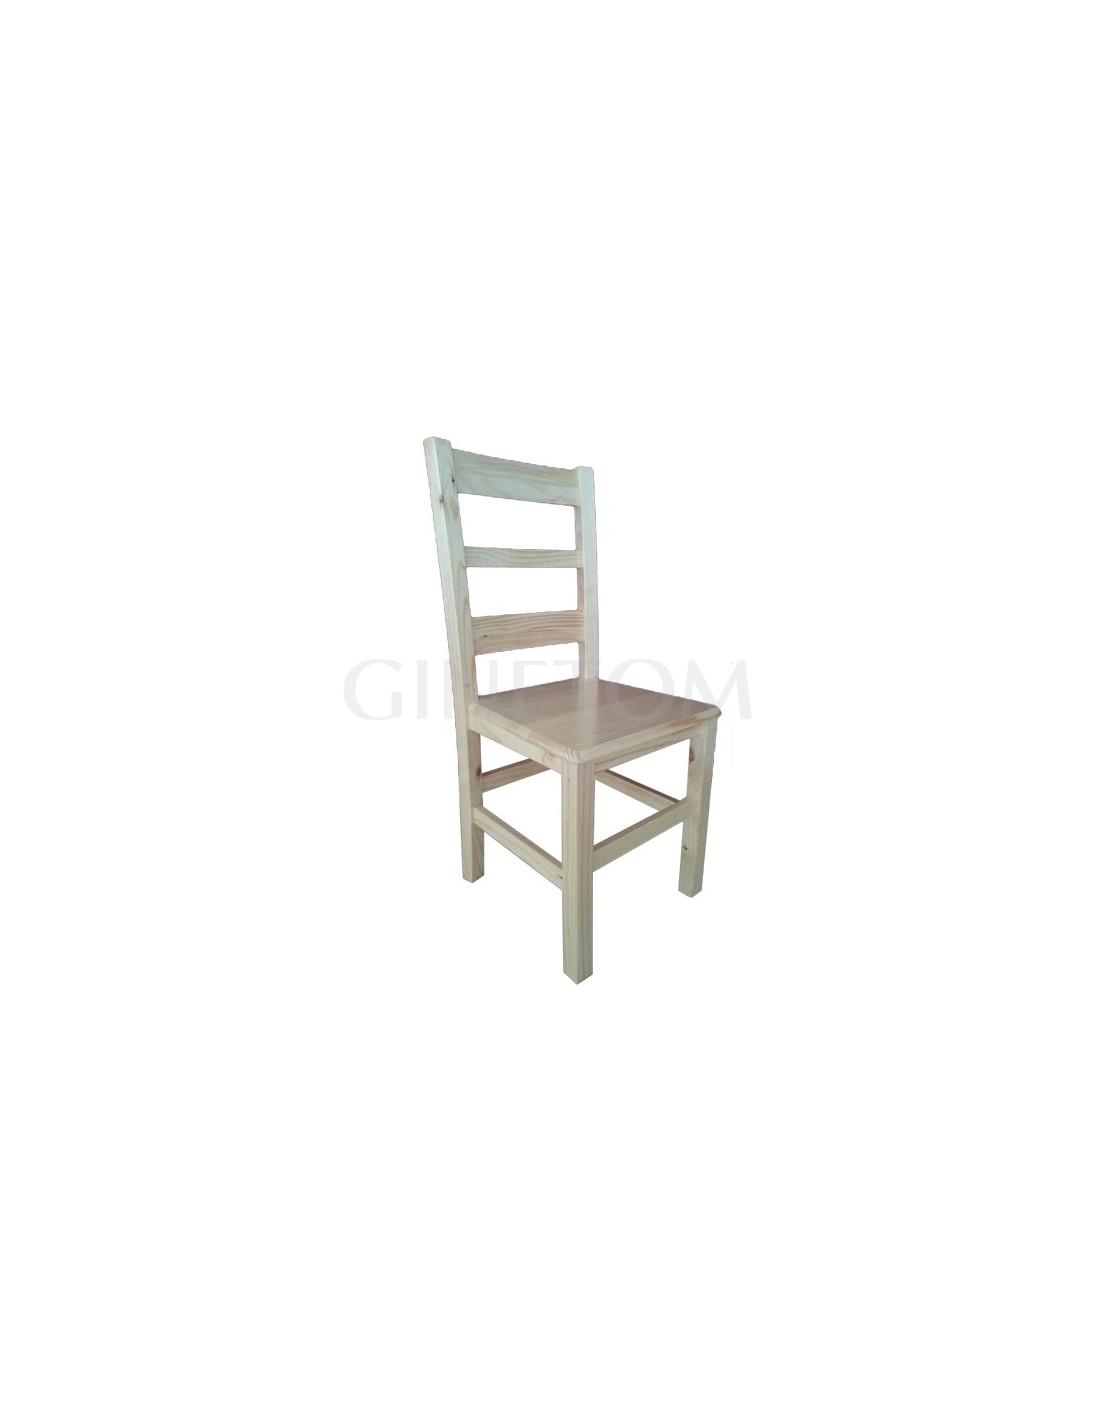 Sillas de madera ref 145 sillas hosteler a de ginetom for Sillas hosteleria